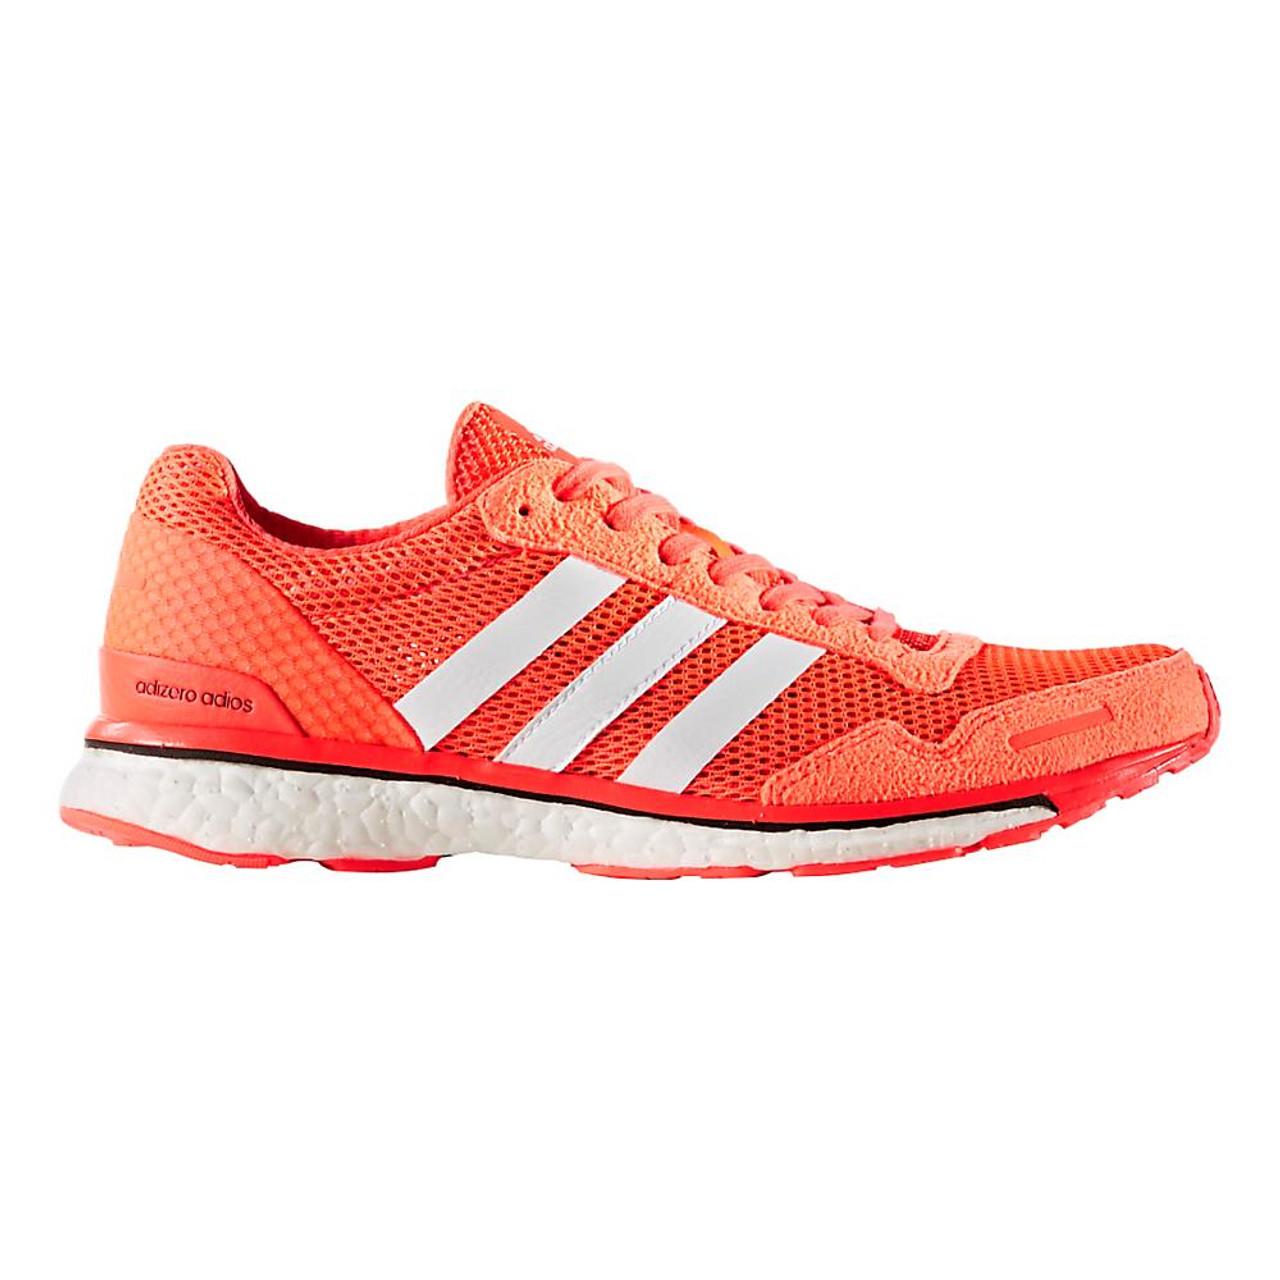 Women's adidas Adizero Adios 3